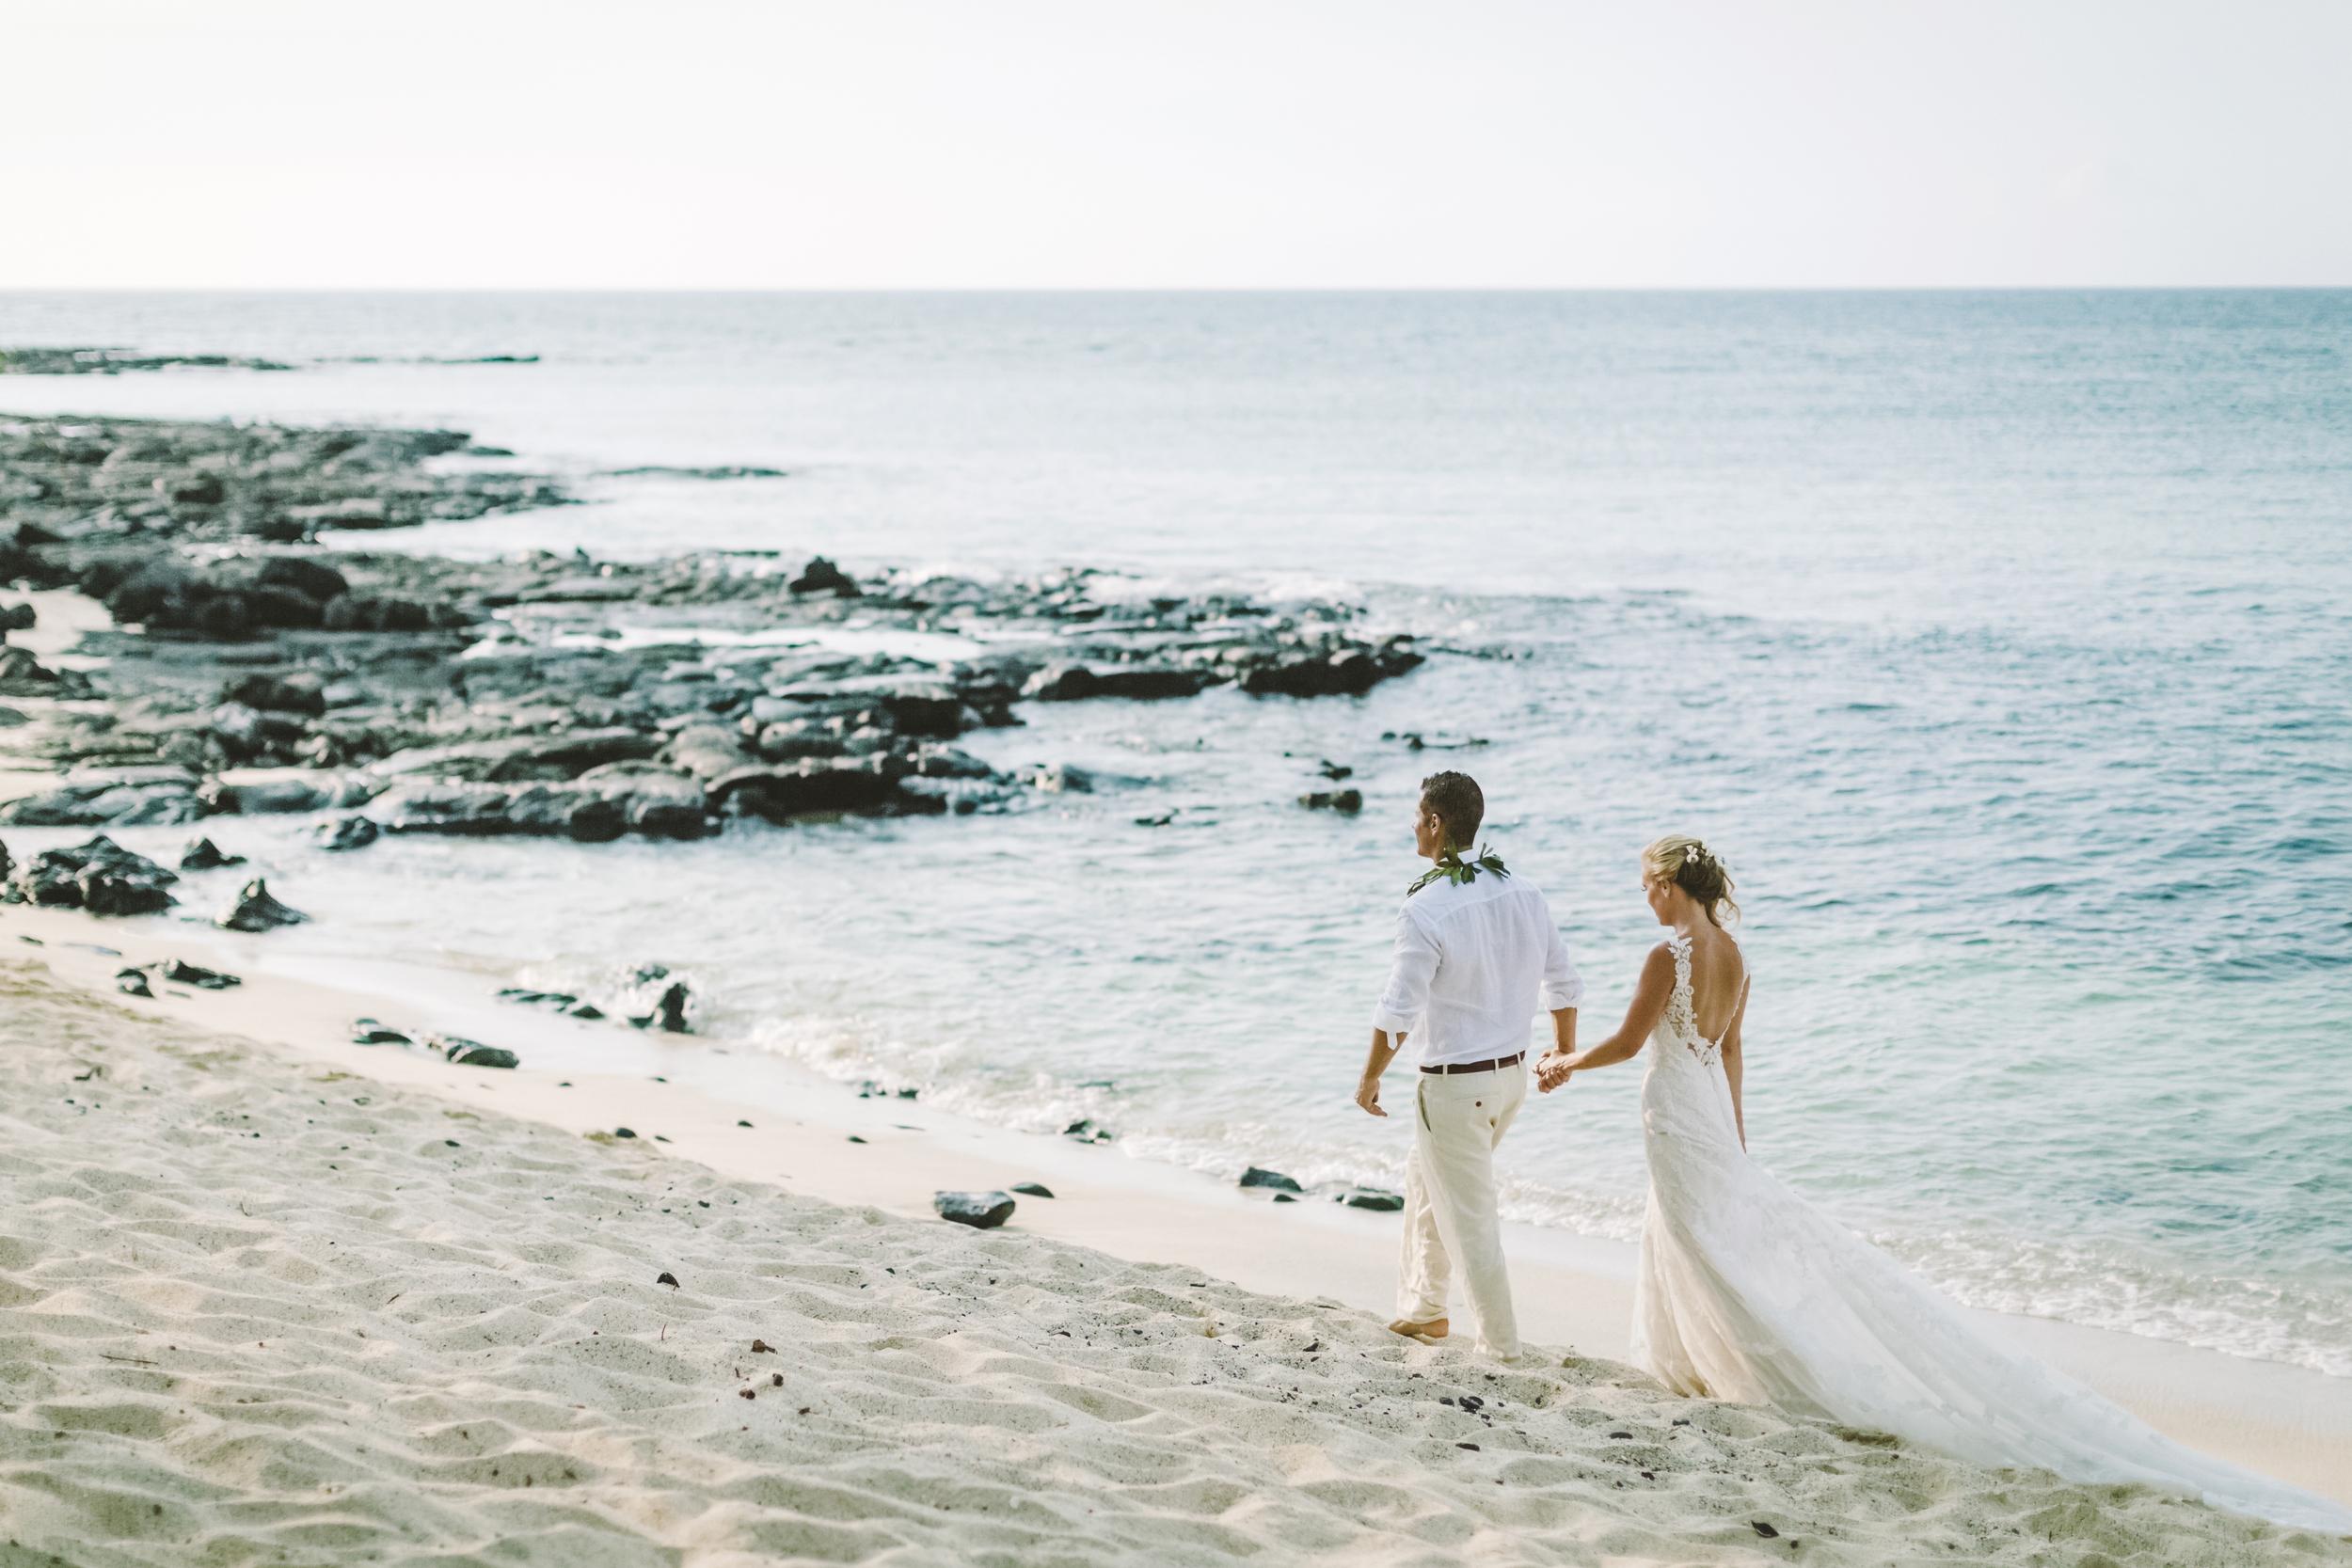 angie-diaz-photography-hawaii-wedding-photographer-kelli-jay-85.jpg